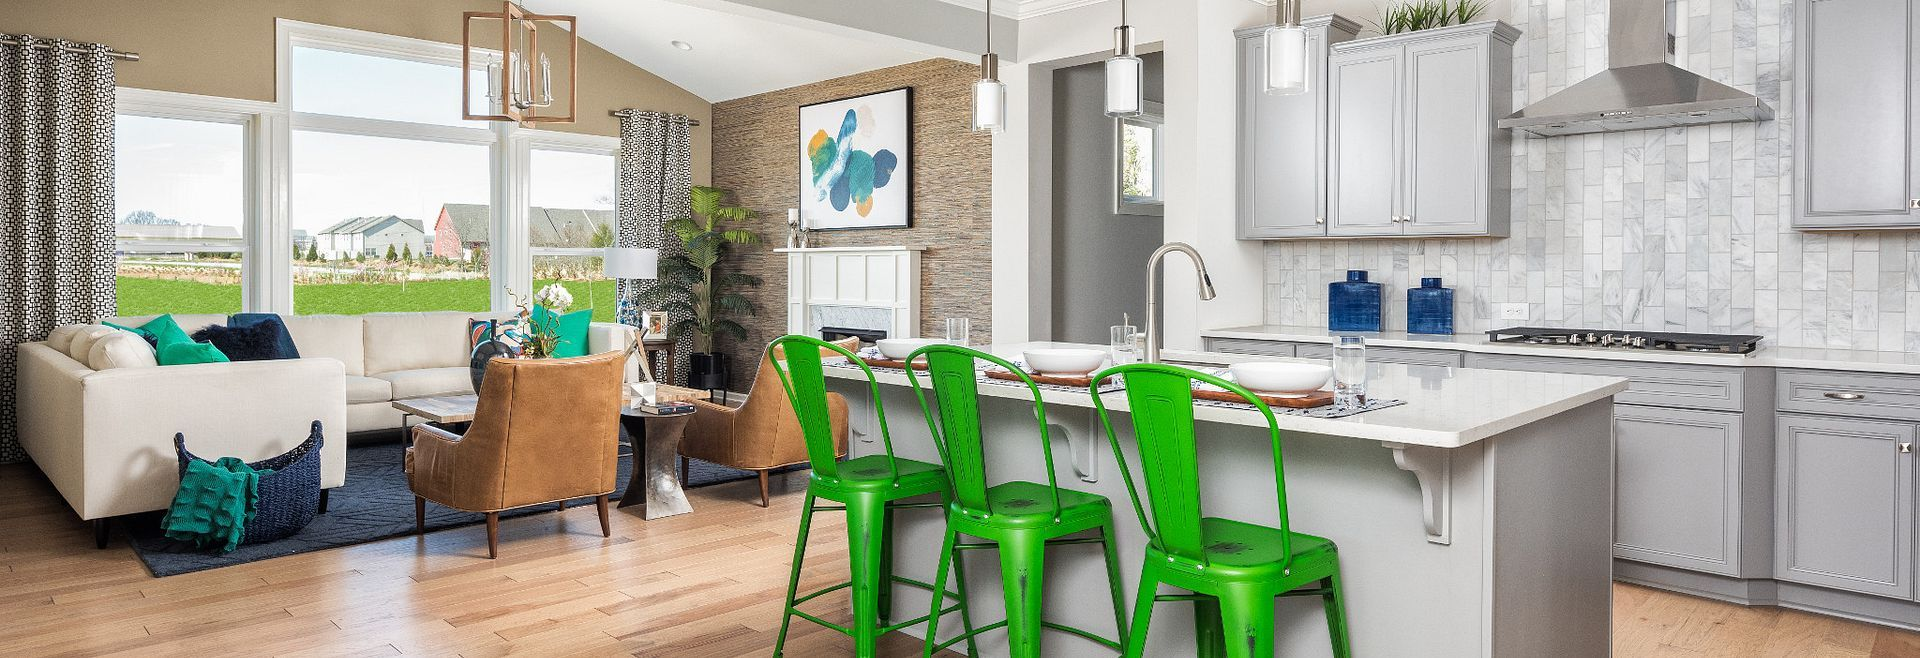 Delaney Plan Kitchen & Family Room:Delaney Model Kitchen & Family Room